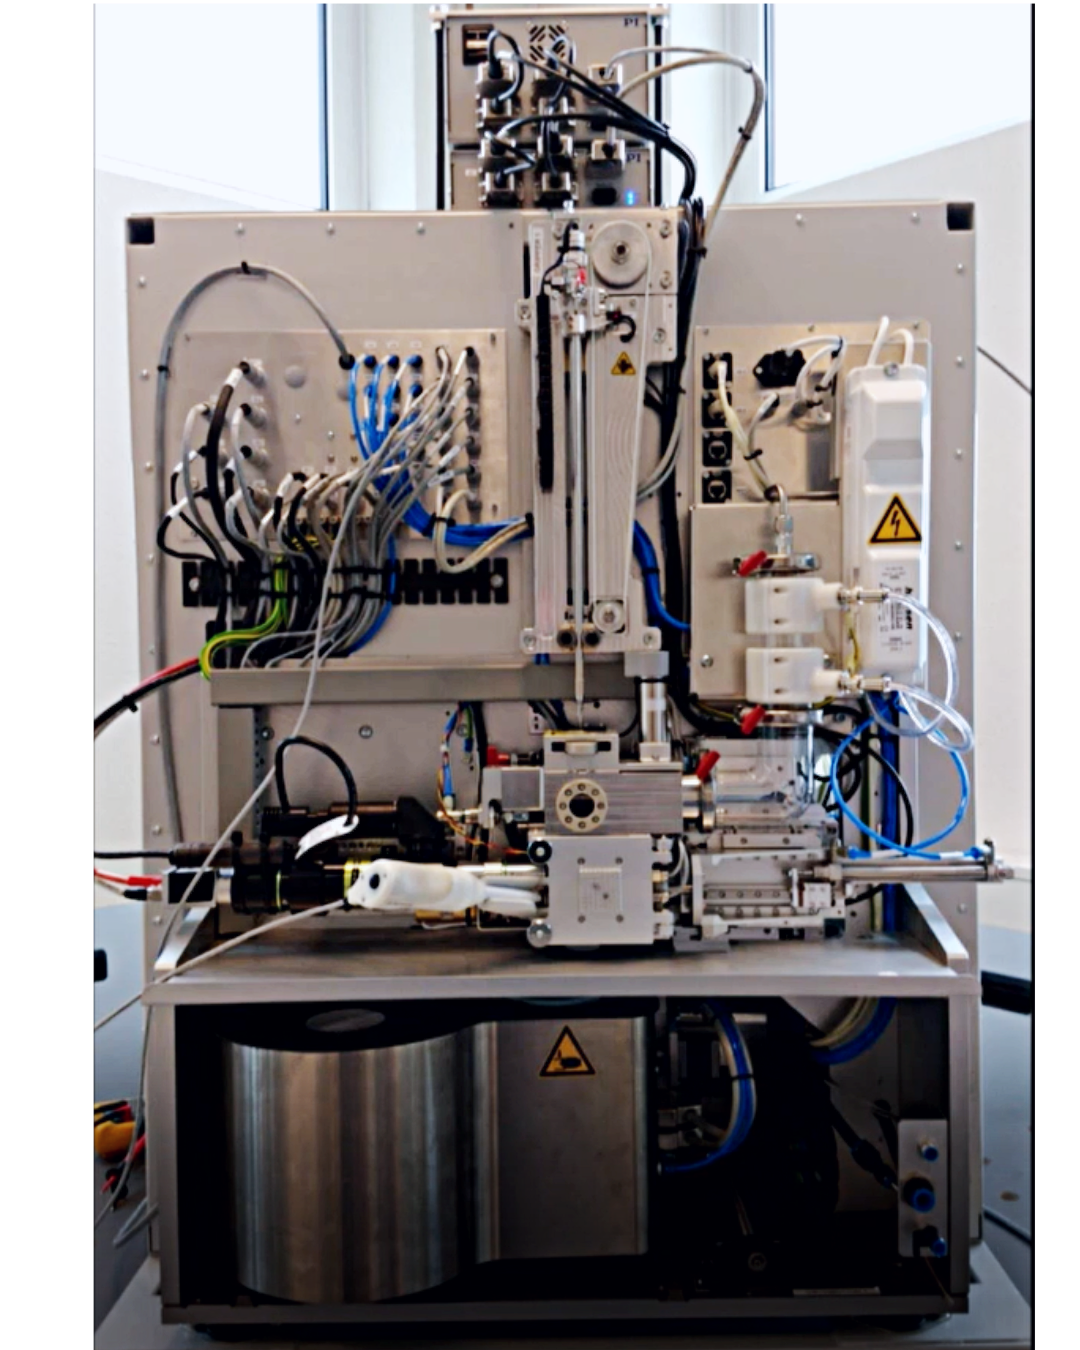 CryoSol VitroJet cryoEM grid sample preparation solution